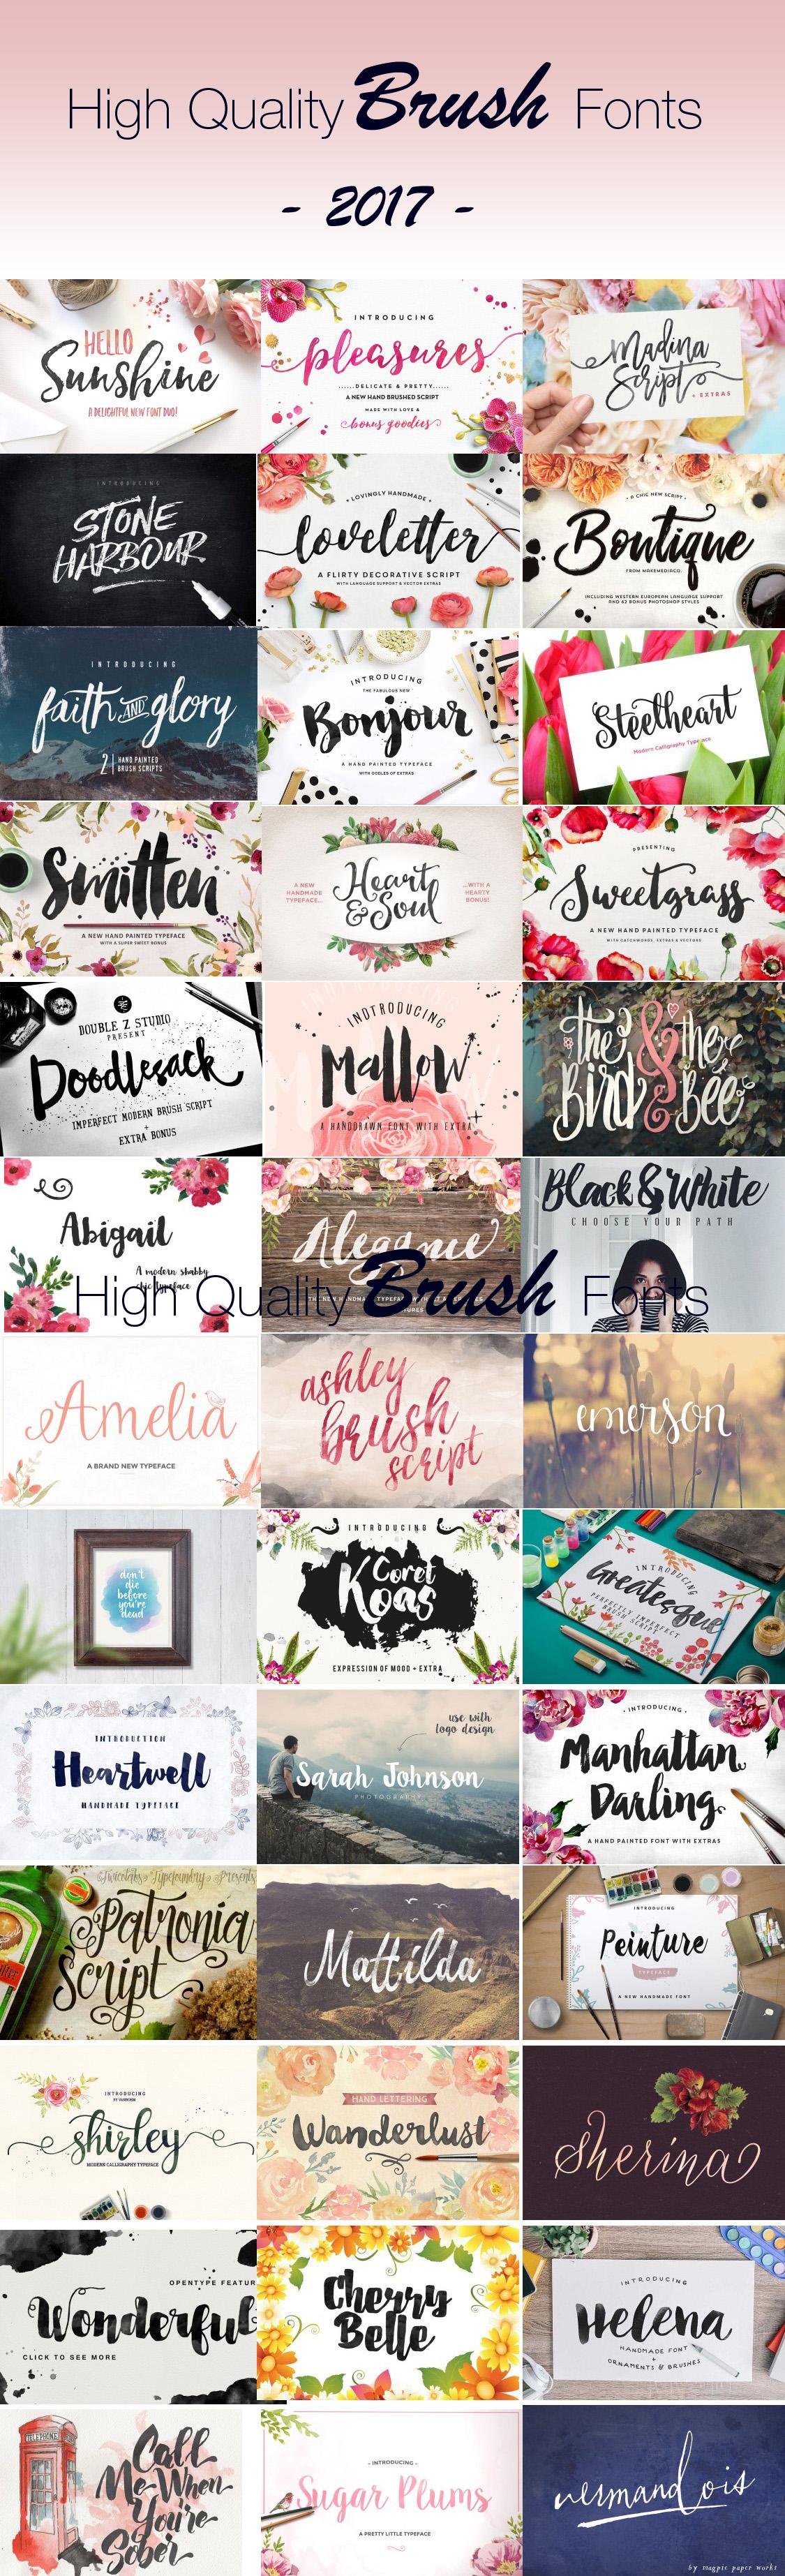 high quality brush fonts